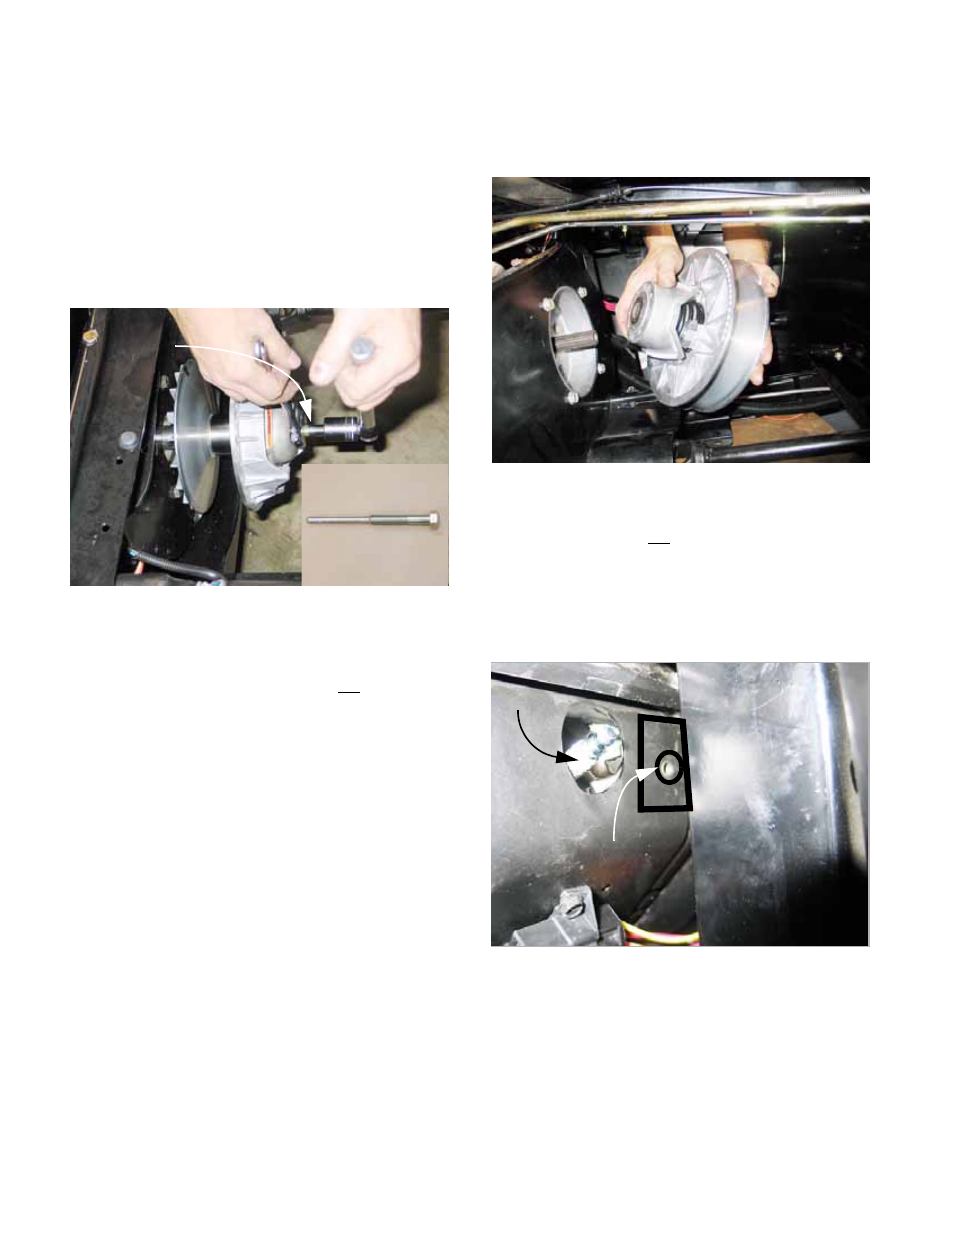 Kohler Enclosed Cvt Addendum Cub Cadet 4 X Volunteer User Manual 316 Engine Schematics Page 72 328